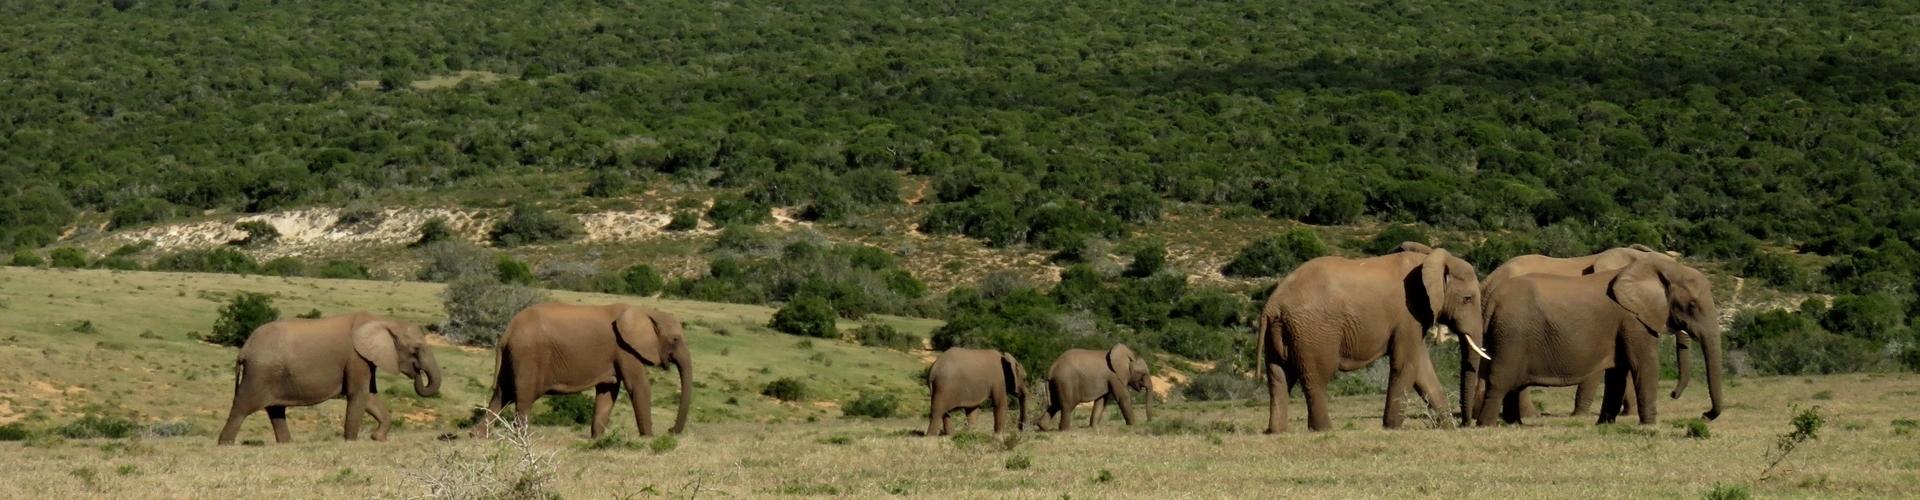 Addo Elephant National Park - Luxe Safari Zuid-Afrika